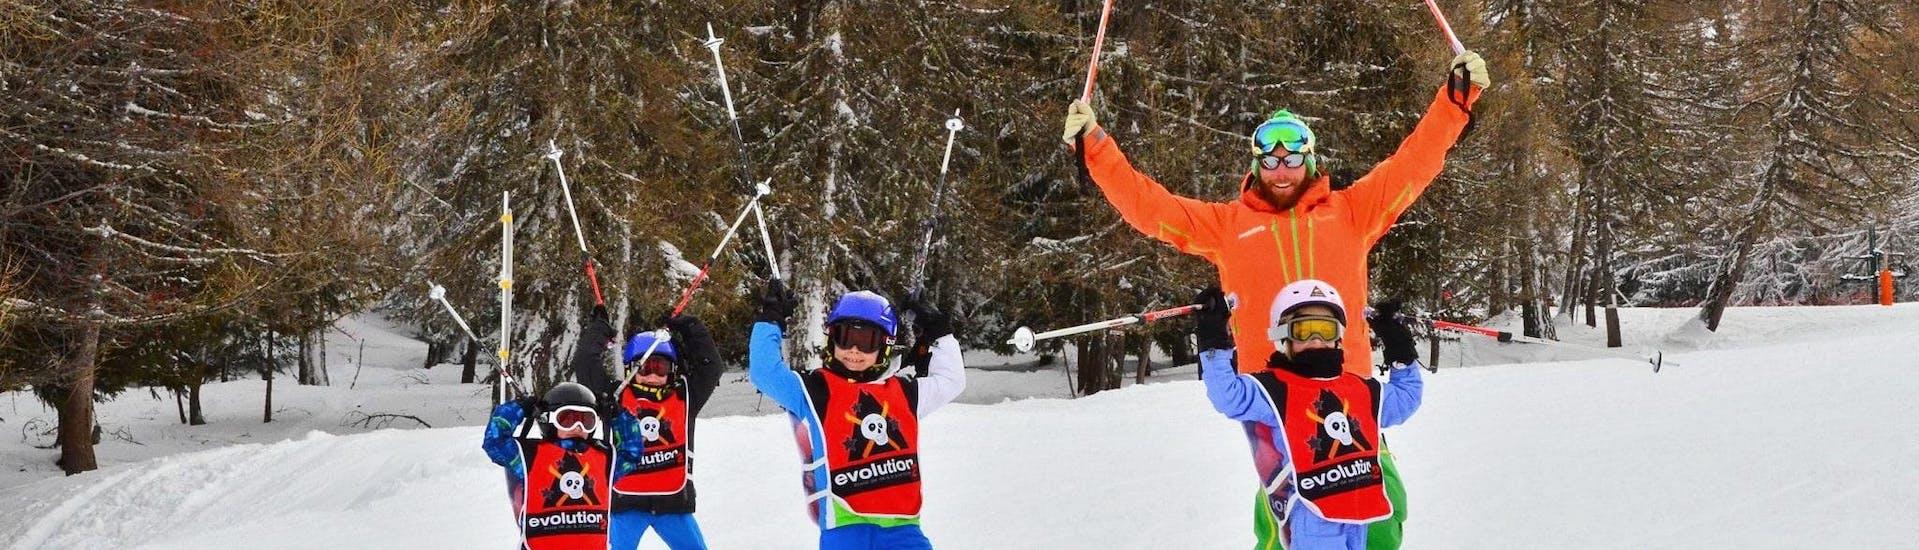 kids-ski-lessons-6-12-y-for-experienced-skiers-evo2-la-plagne-hero